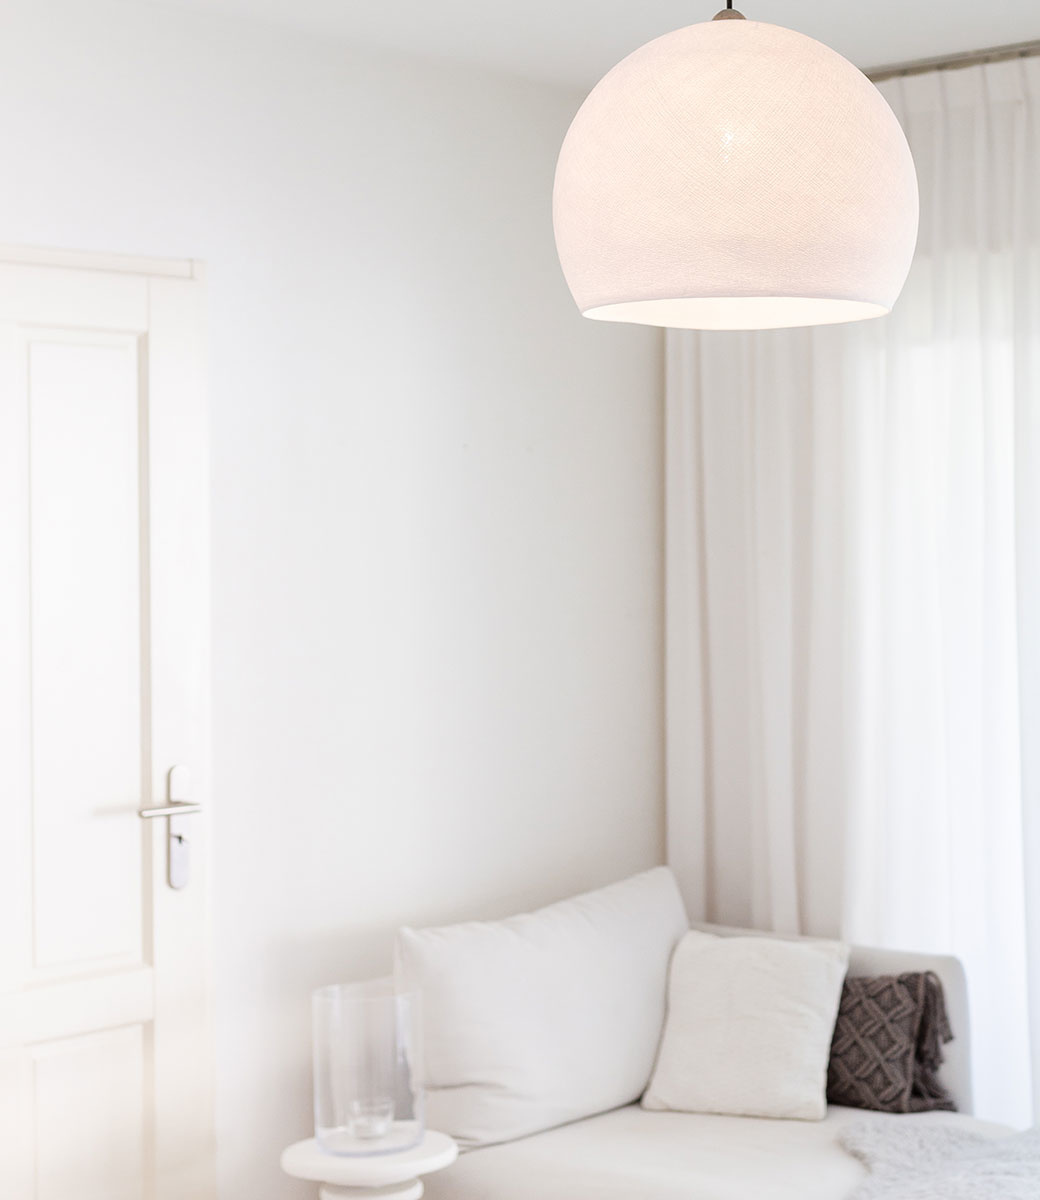 Cotton Ball Lights Inspiration Bedroom White Three Quarter Lamp Cotton Ball Lights